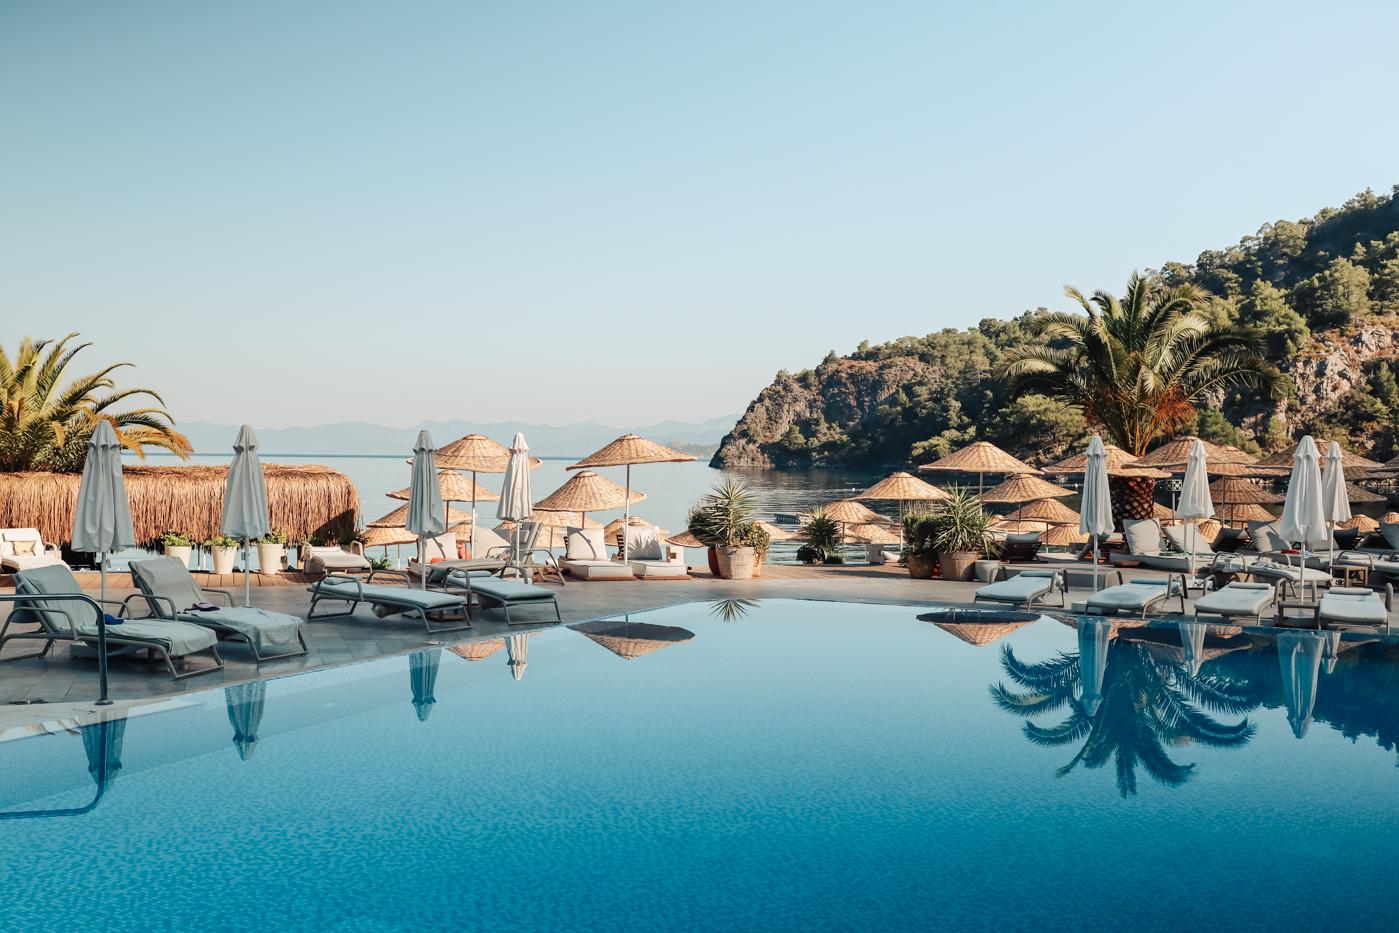 The Hillside Beach Club pool.